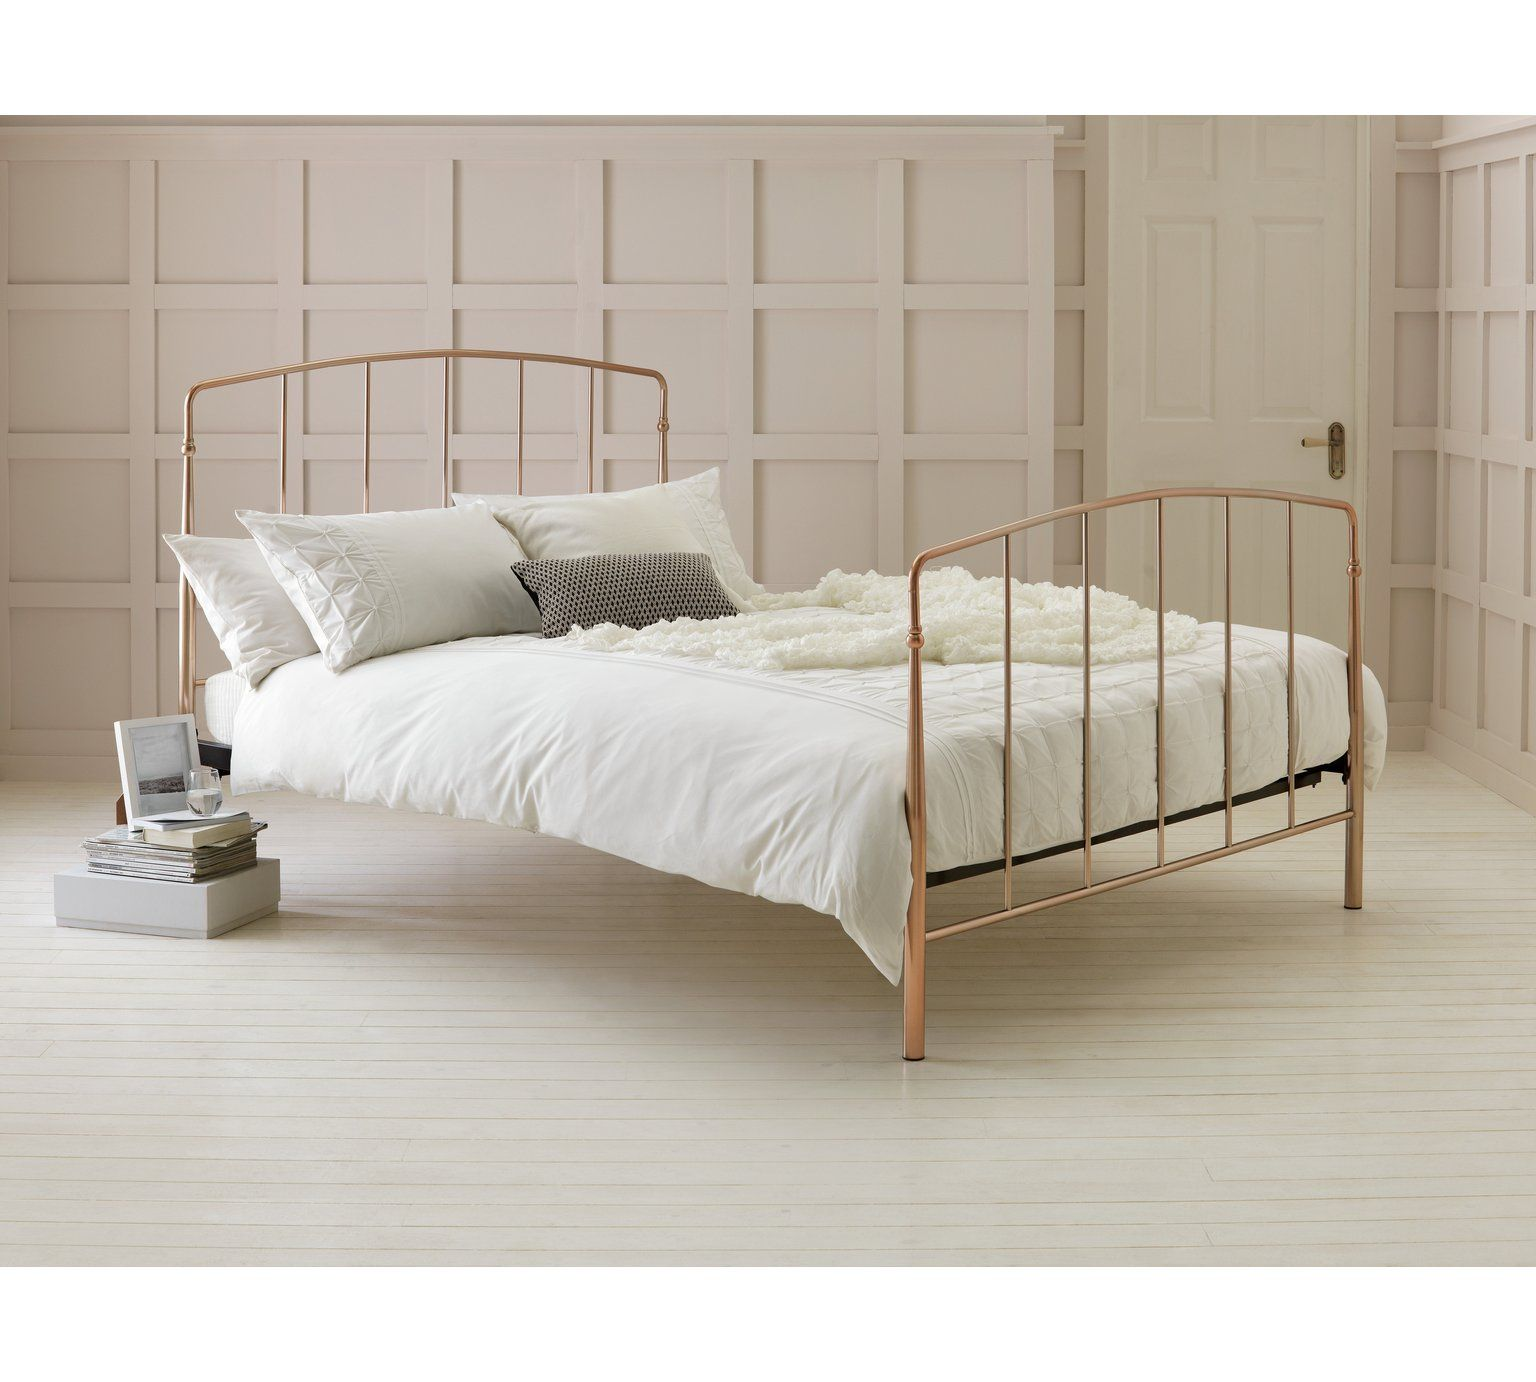 best website 45d70 e9c9b Buy Argos Home Aurelie Double Bed Frame - Rose Gold ...